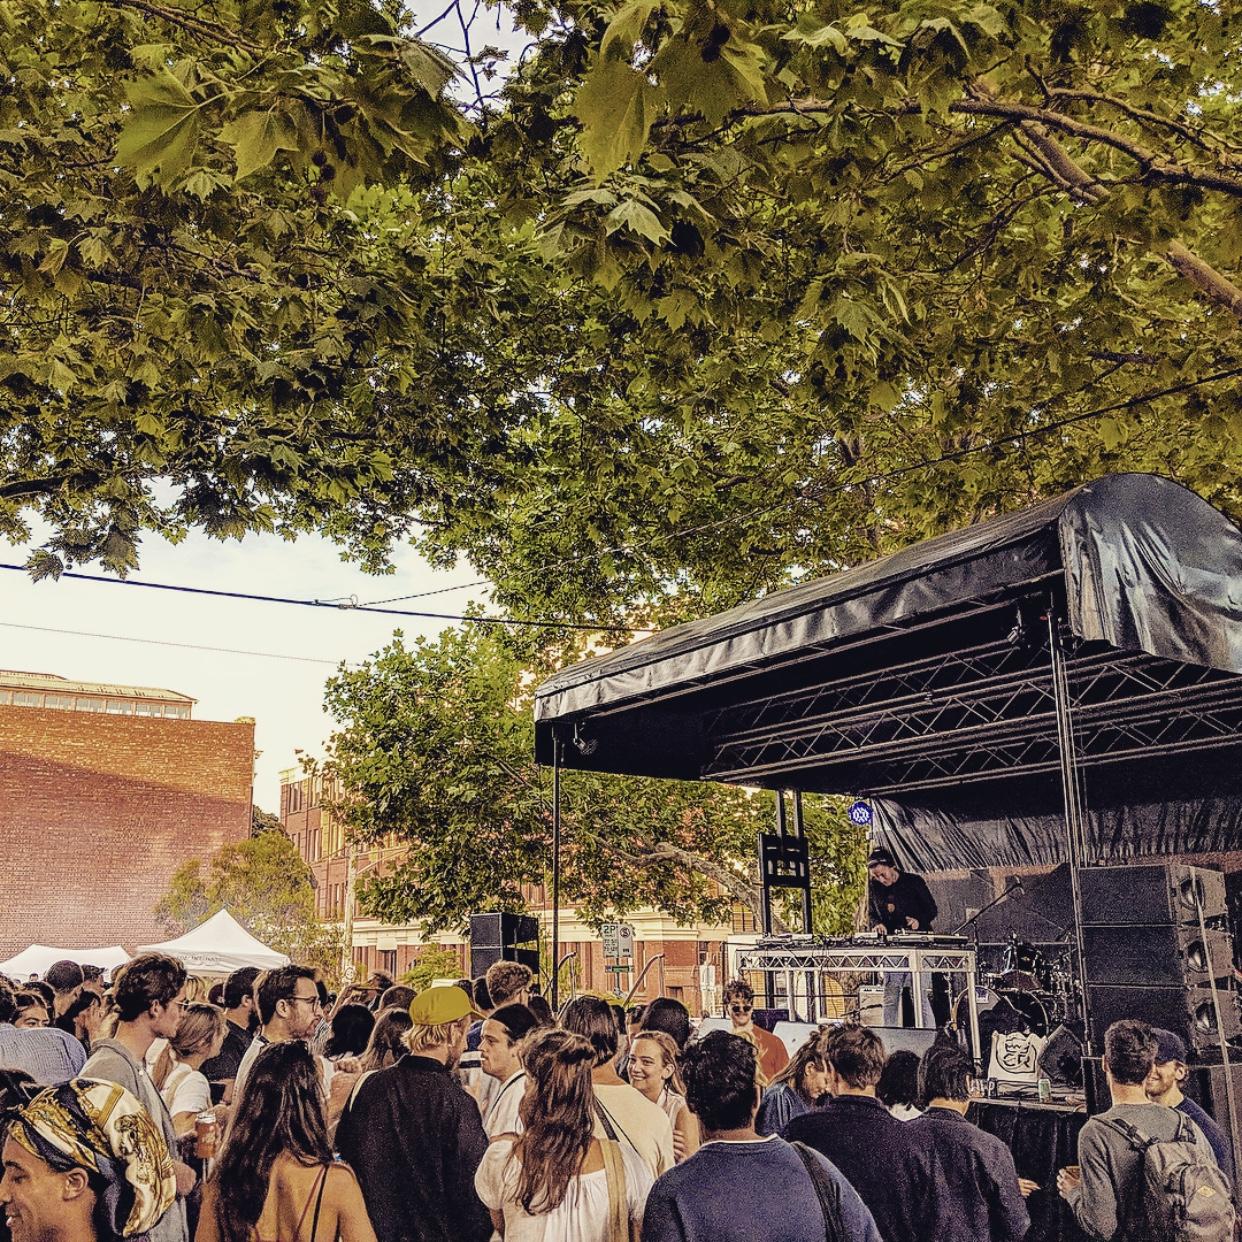 Nong Sound at Peel Street festival